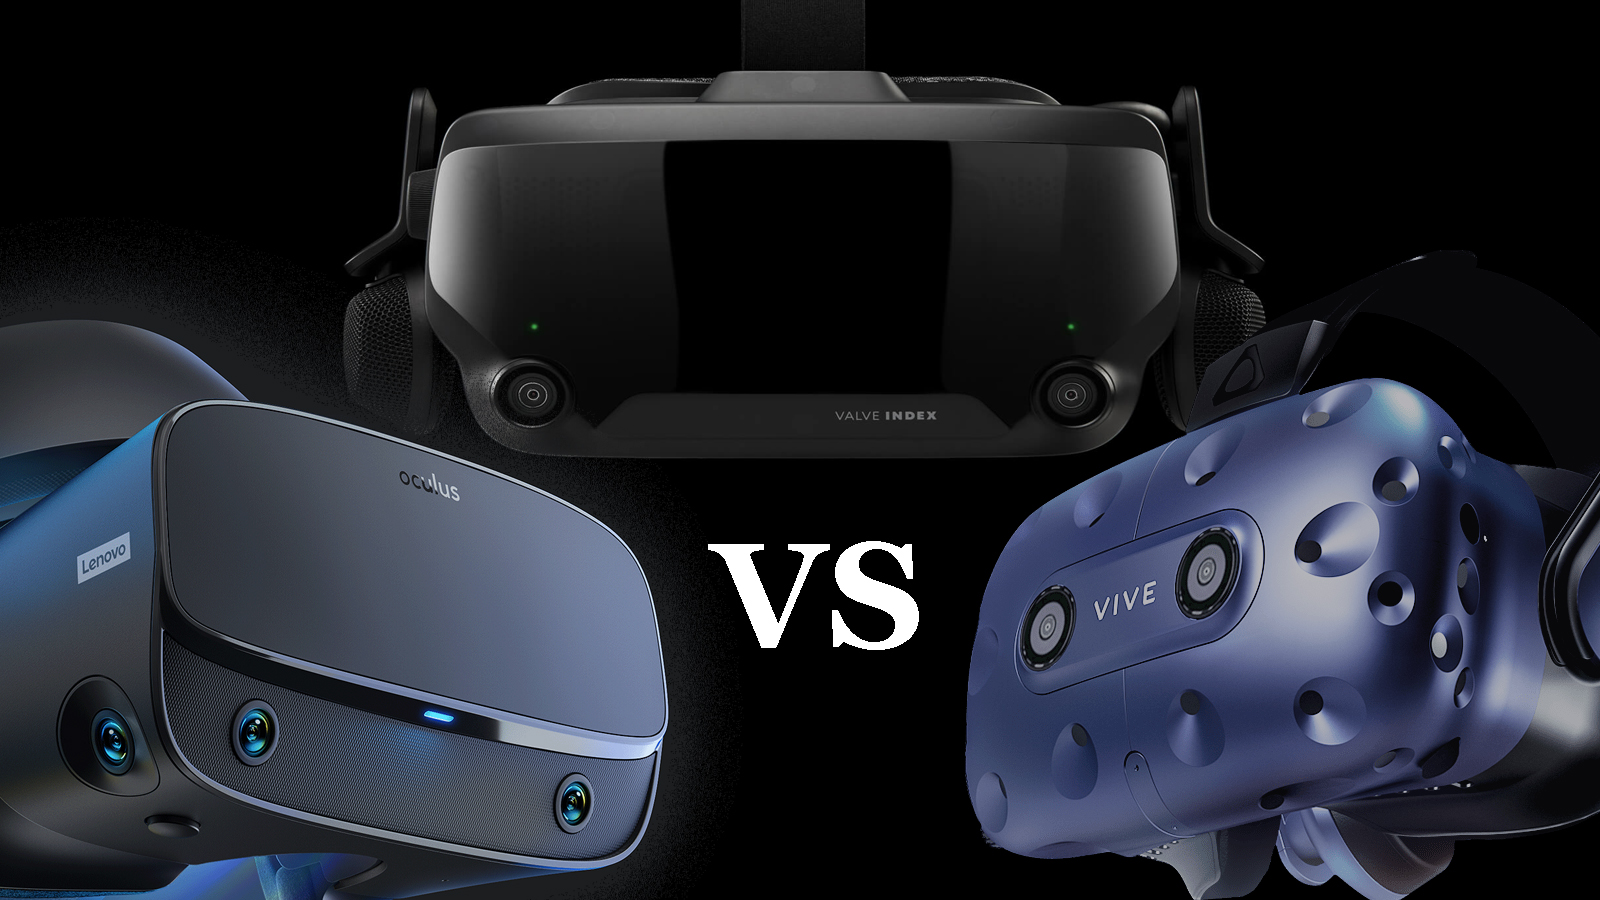 Valve Index Vs Htc Vive Pro Vs Oculus Rift S The Vr Headset